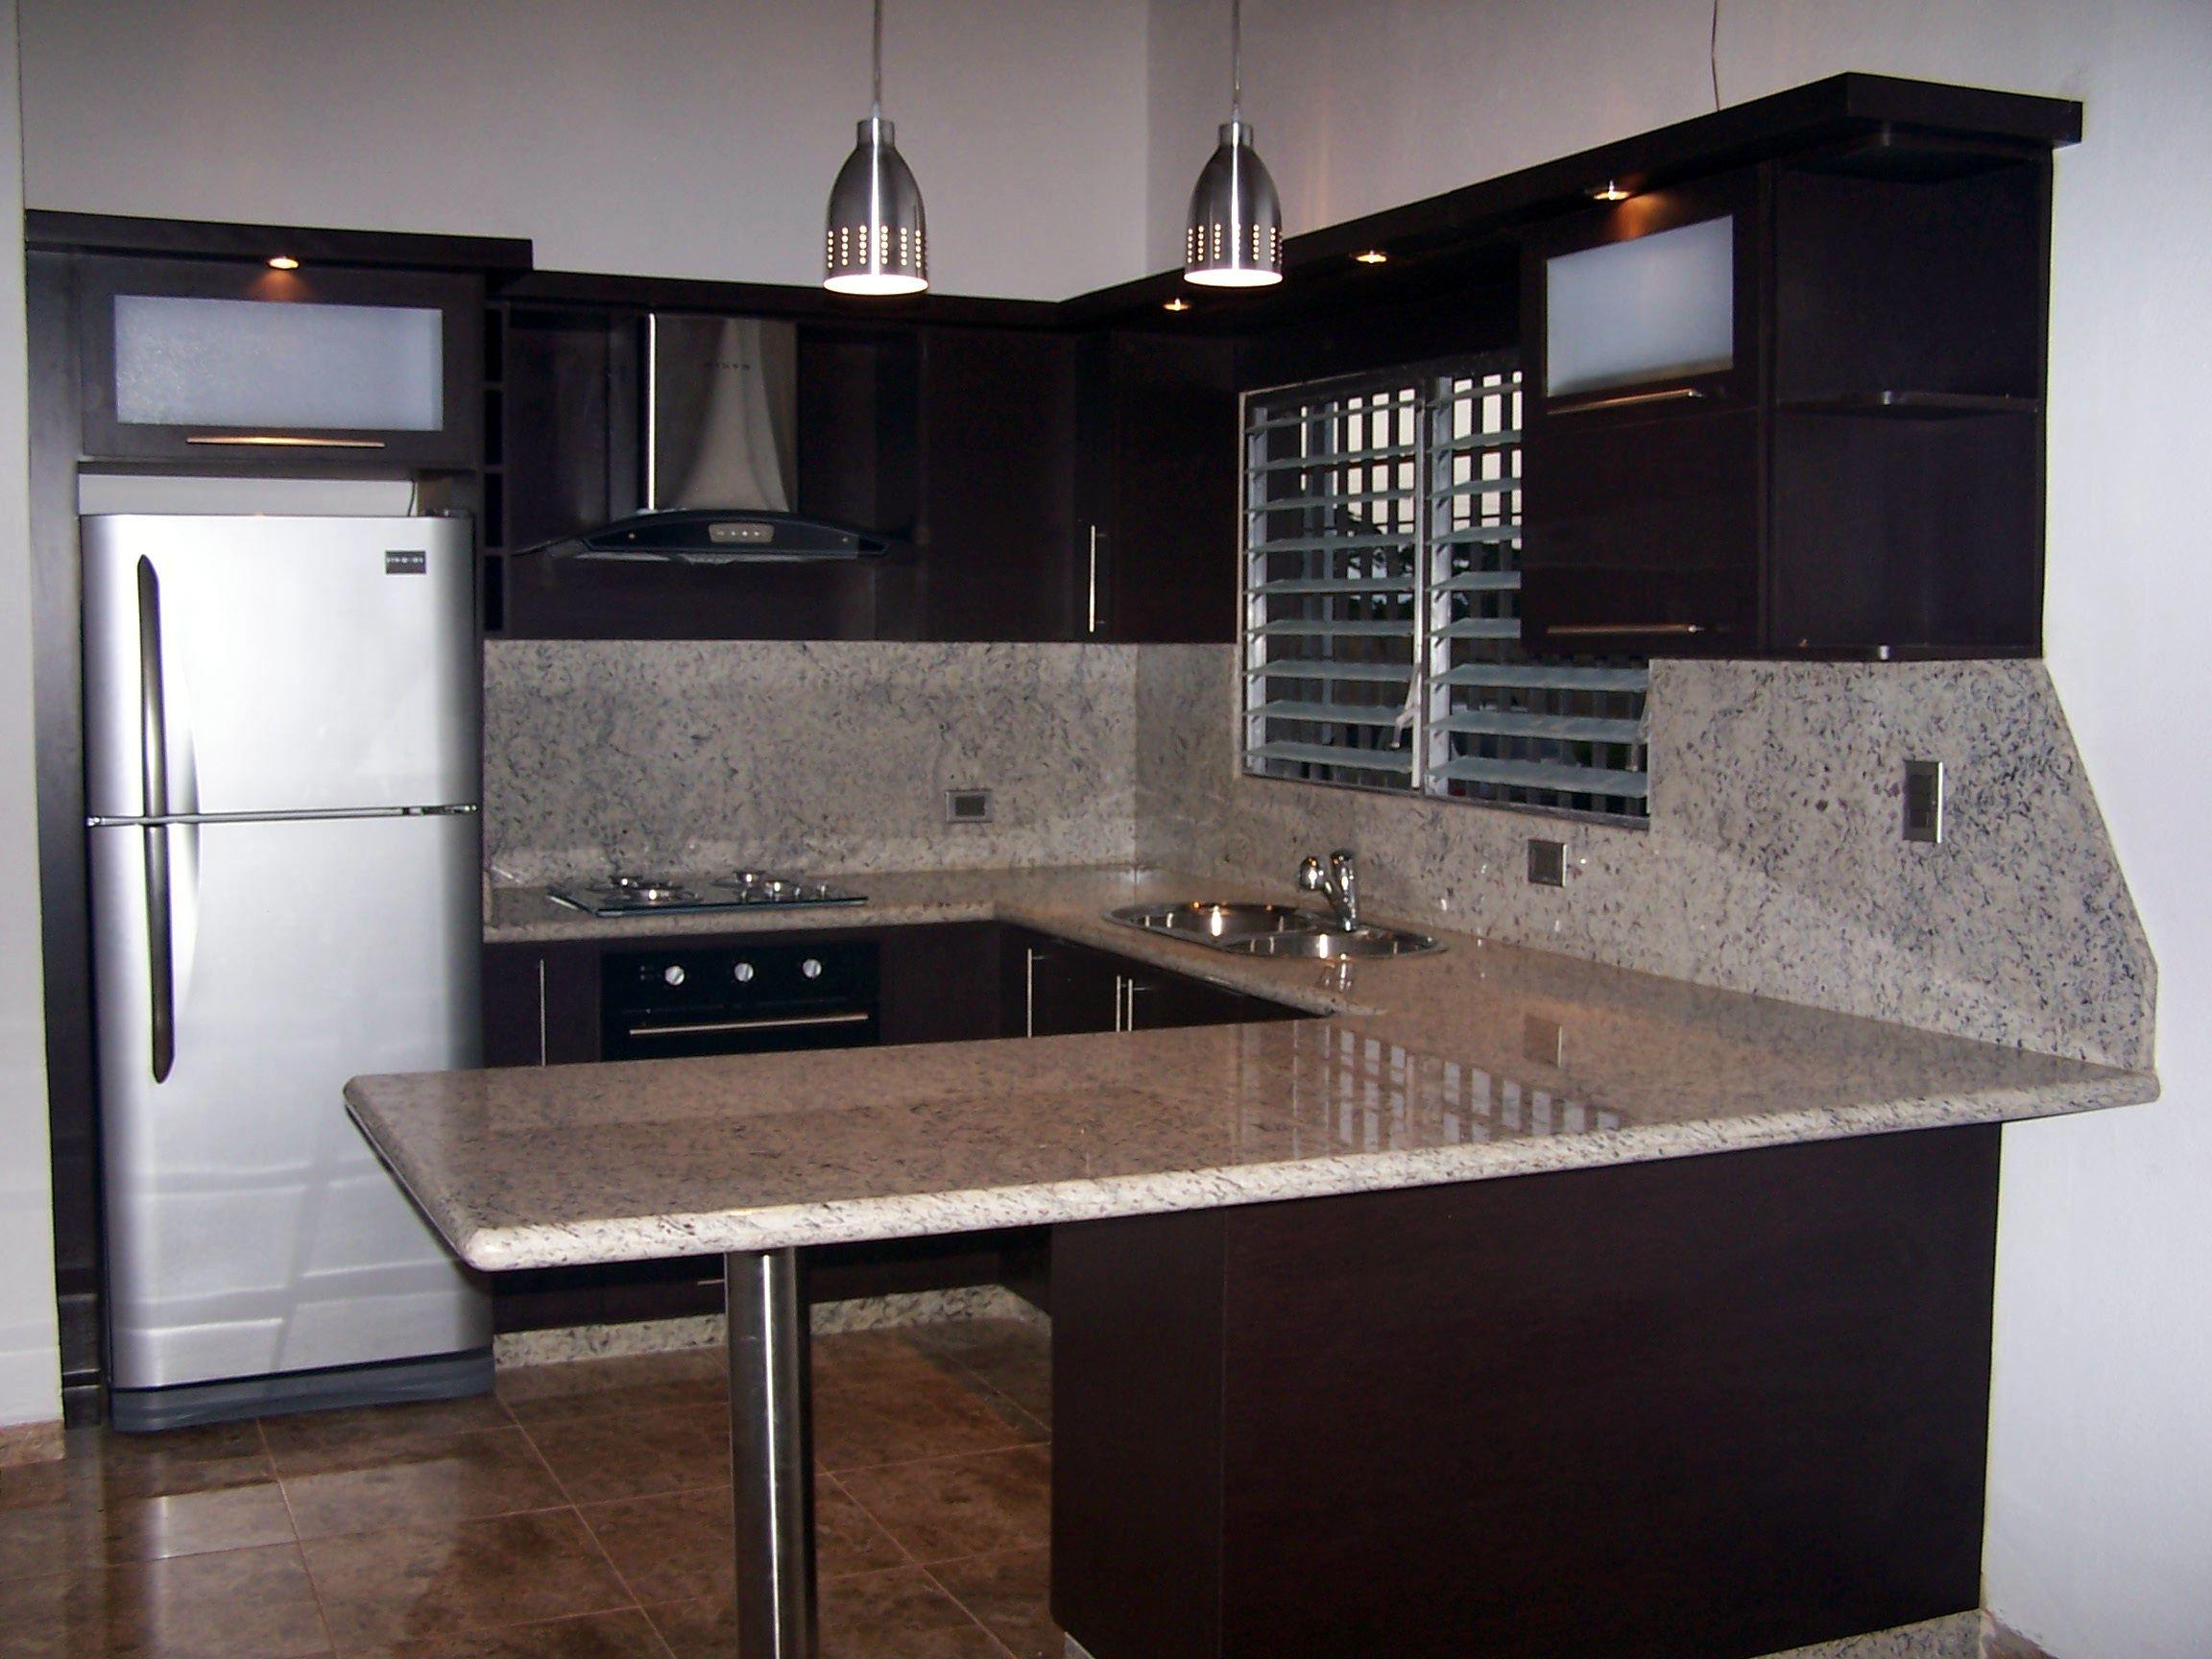 Cocina empotrada | Casa | Pinterest | Cocina empotrada, Madera y Cocinas